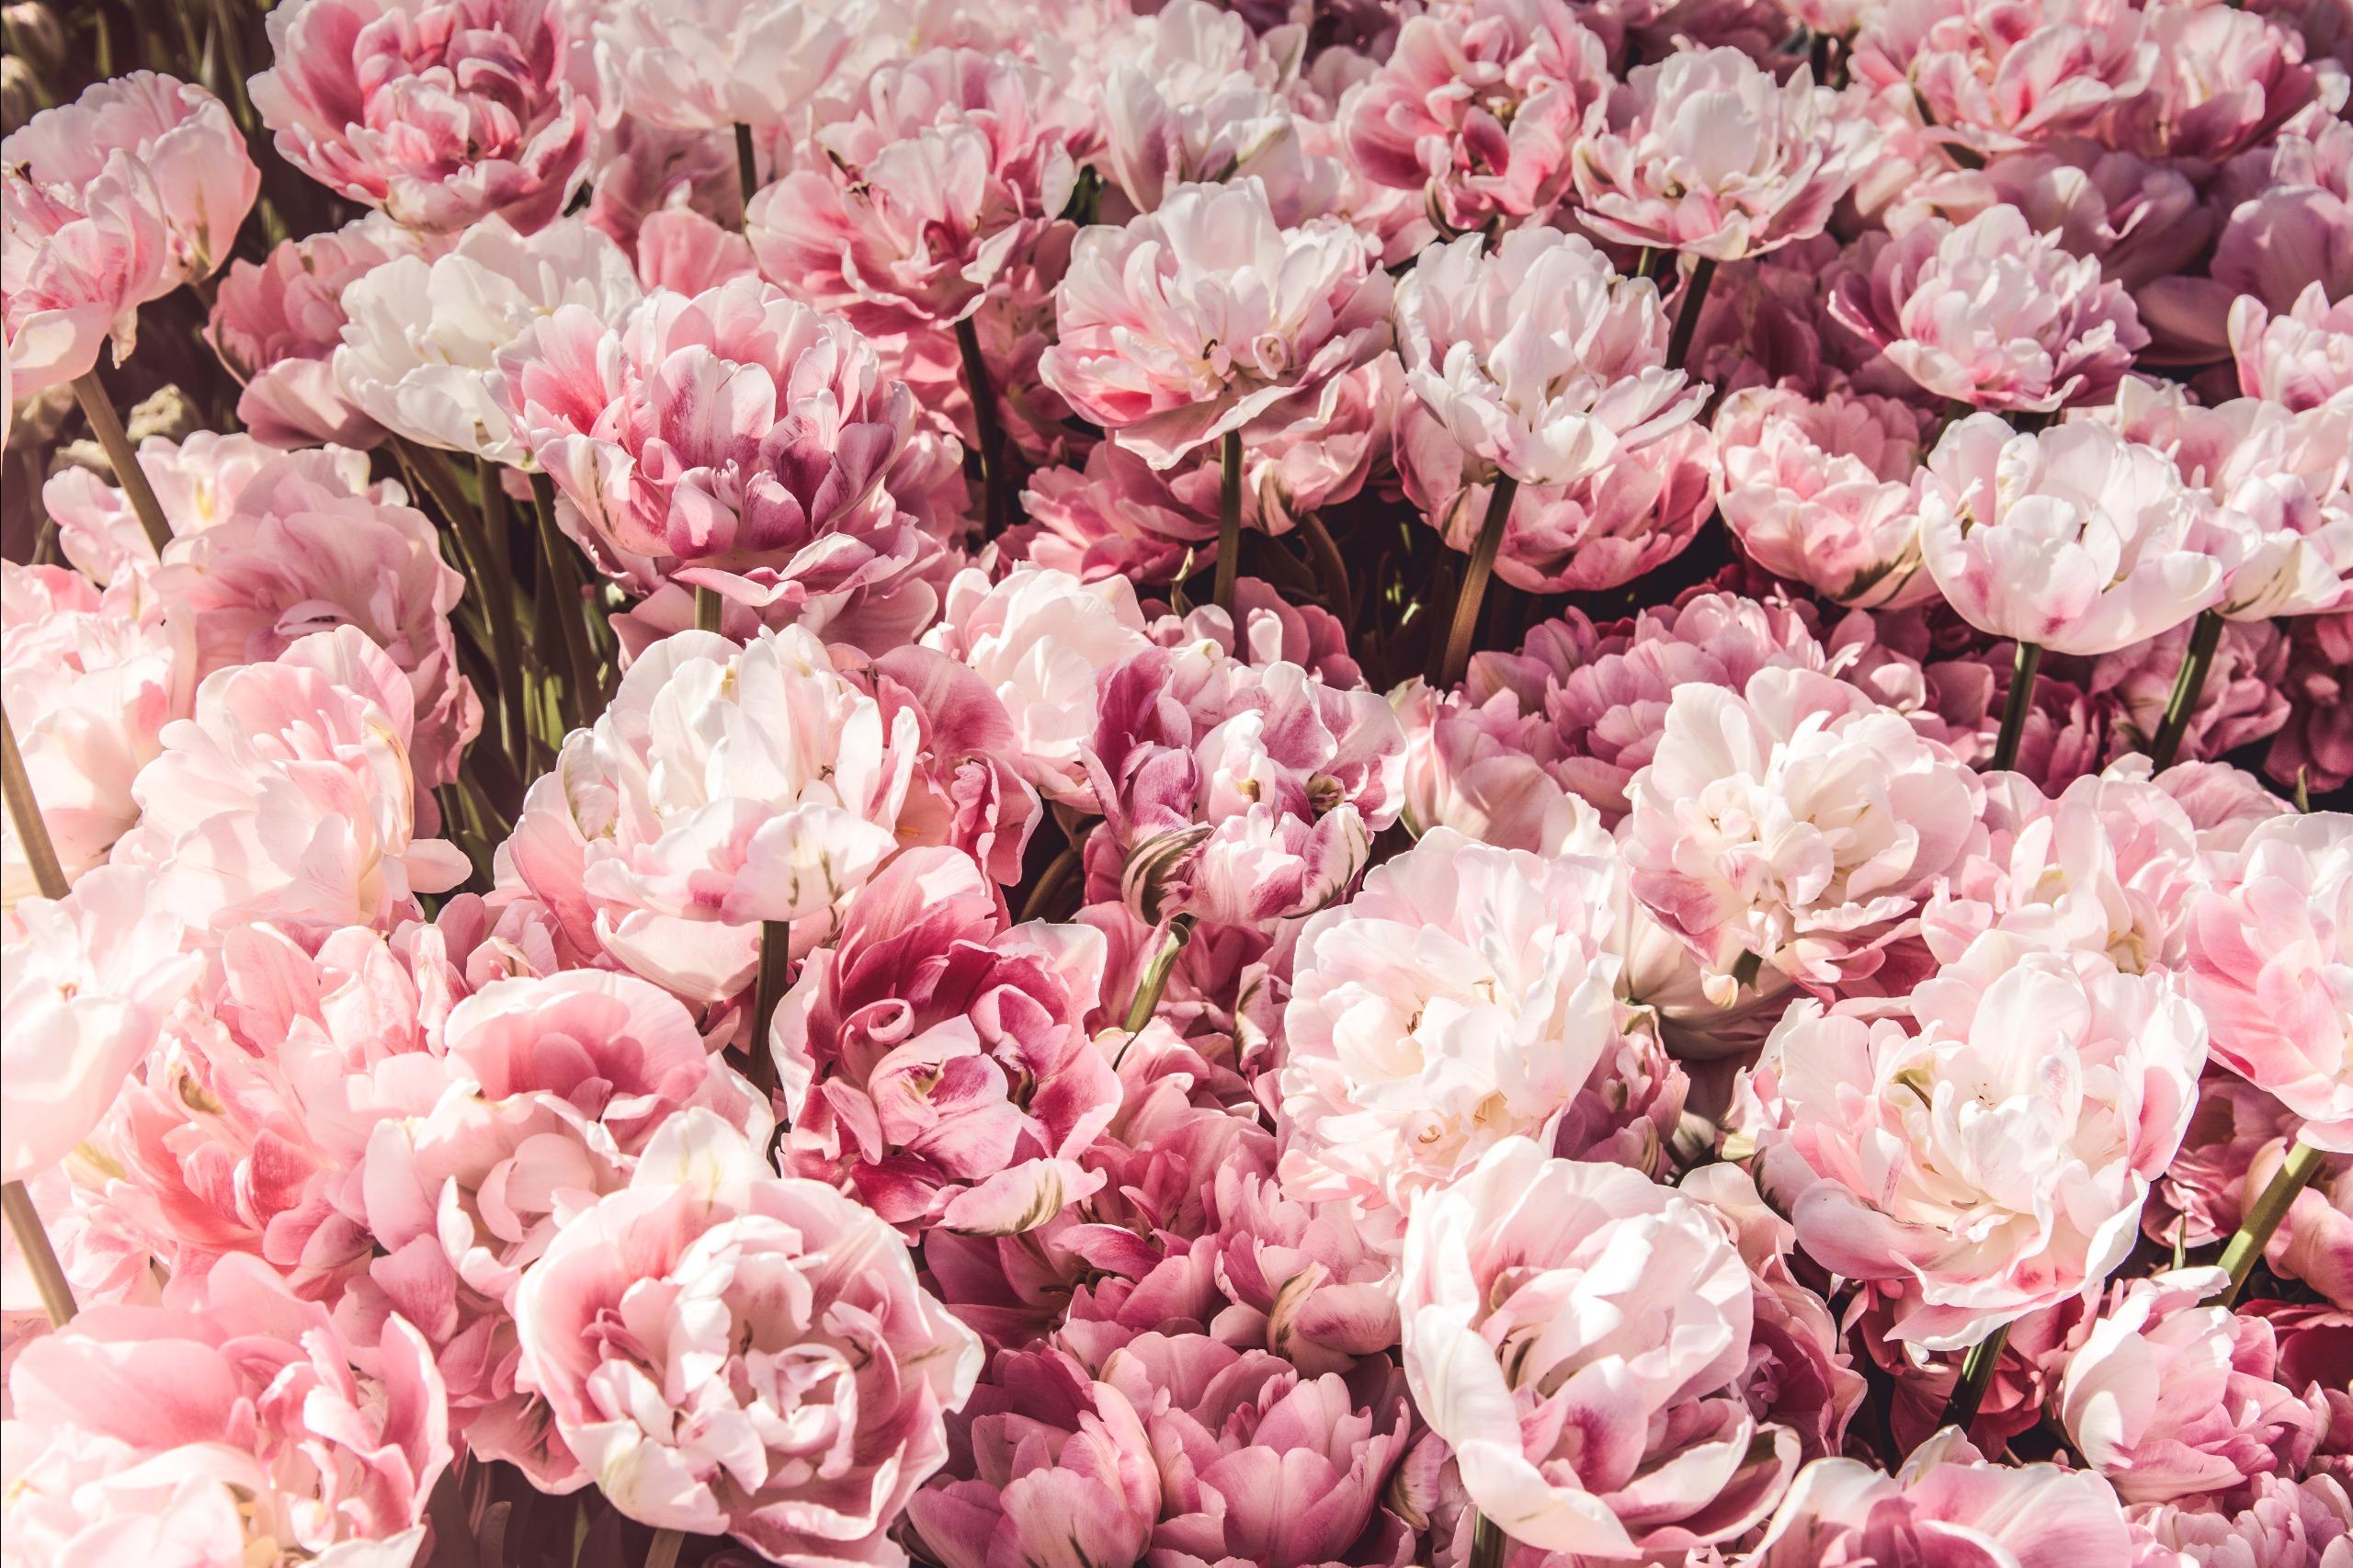 Give us your best edit!Unsplash (Public Domain)#FreeToEdit #flowers #pink #PastelColor #backgrounds #nature #texture #light #shadow #smell